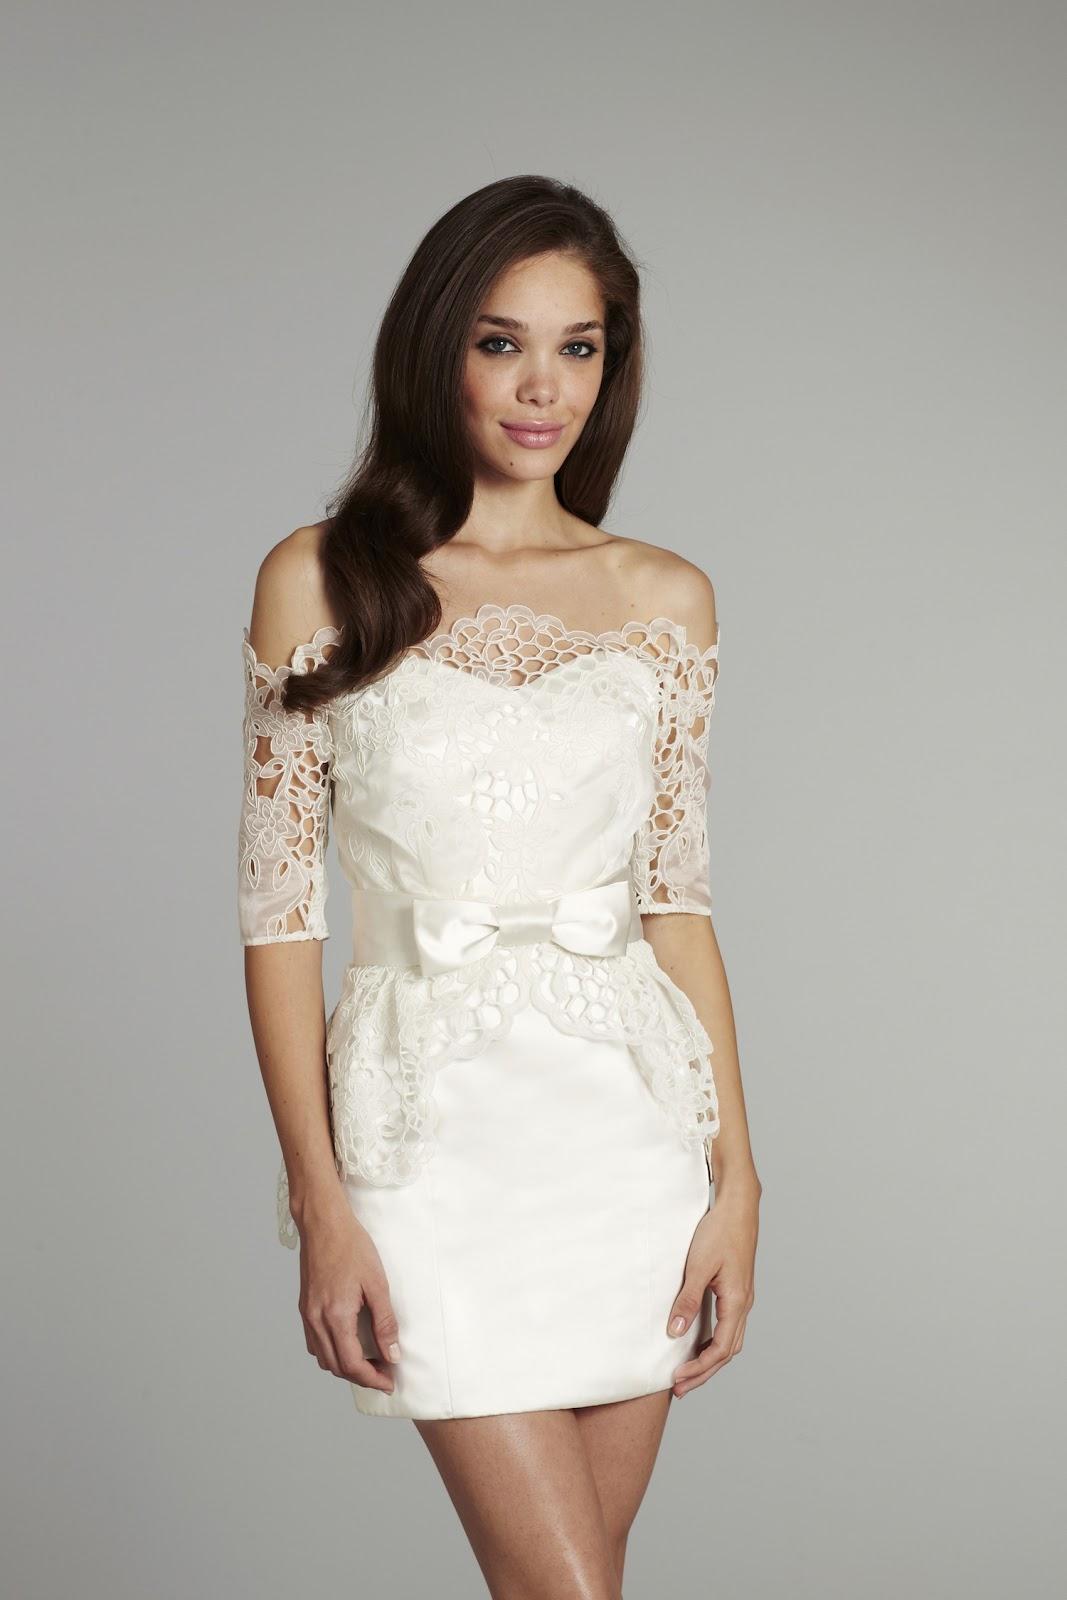 bridal fashion show get unique wedding dress ideas